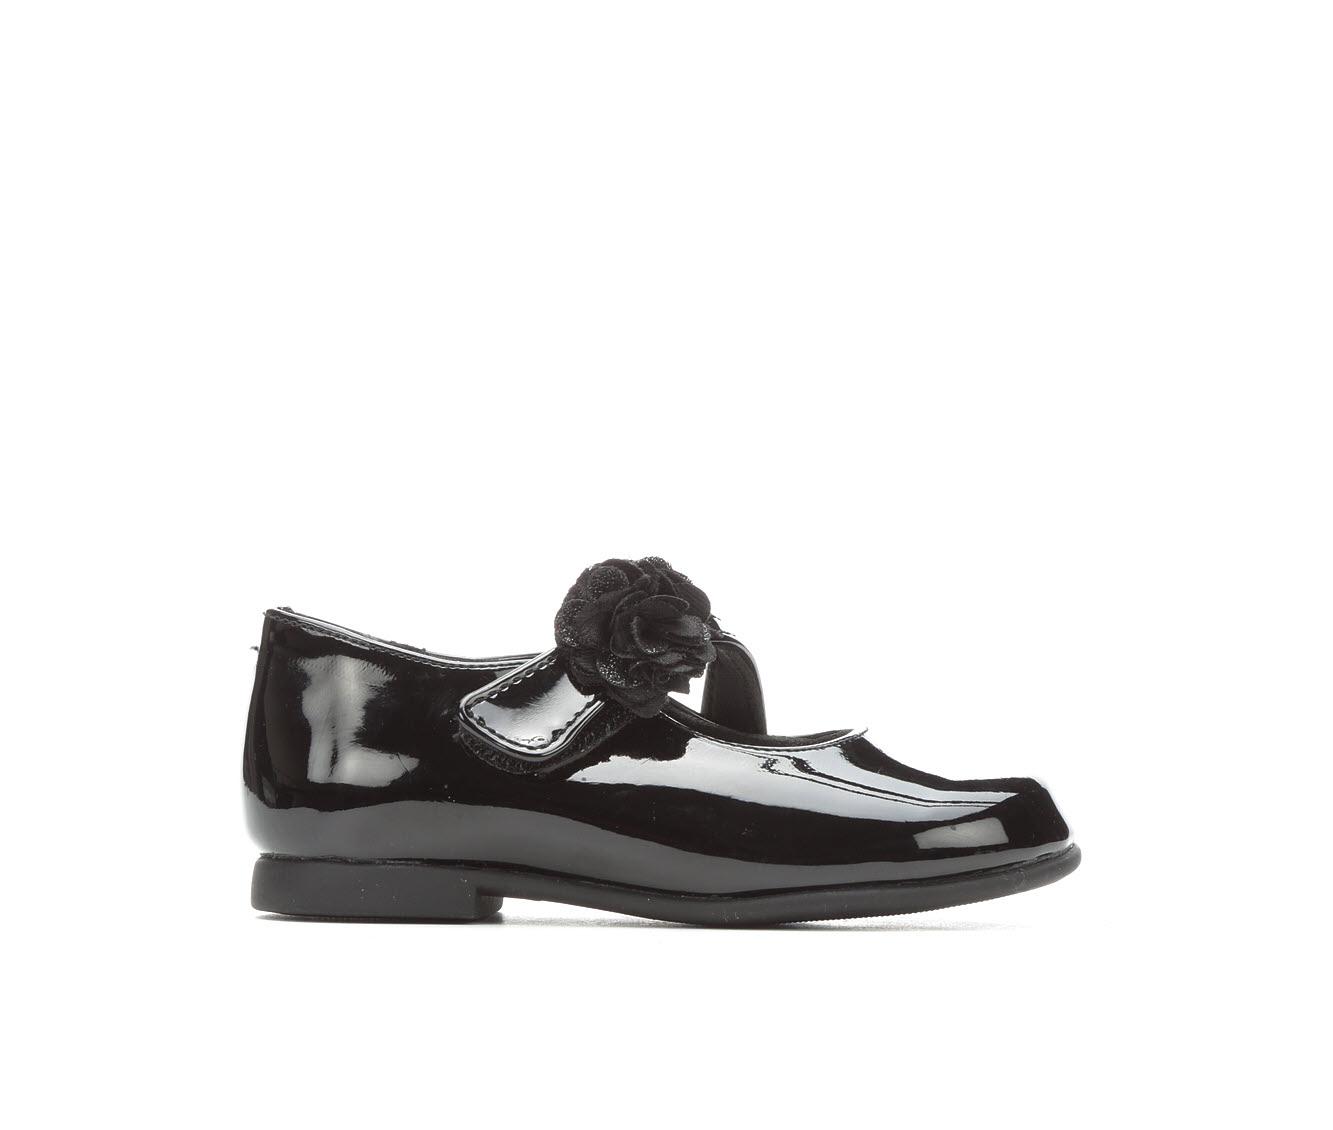 Rachel Shoes Toddler Lil Brena Children's Shoe (Black - Size 7 - Toddler)